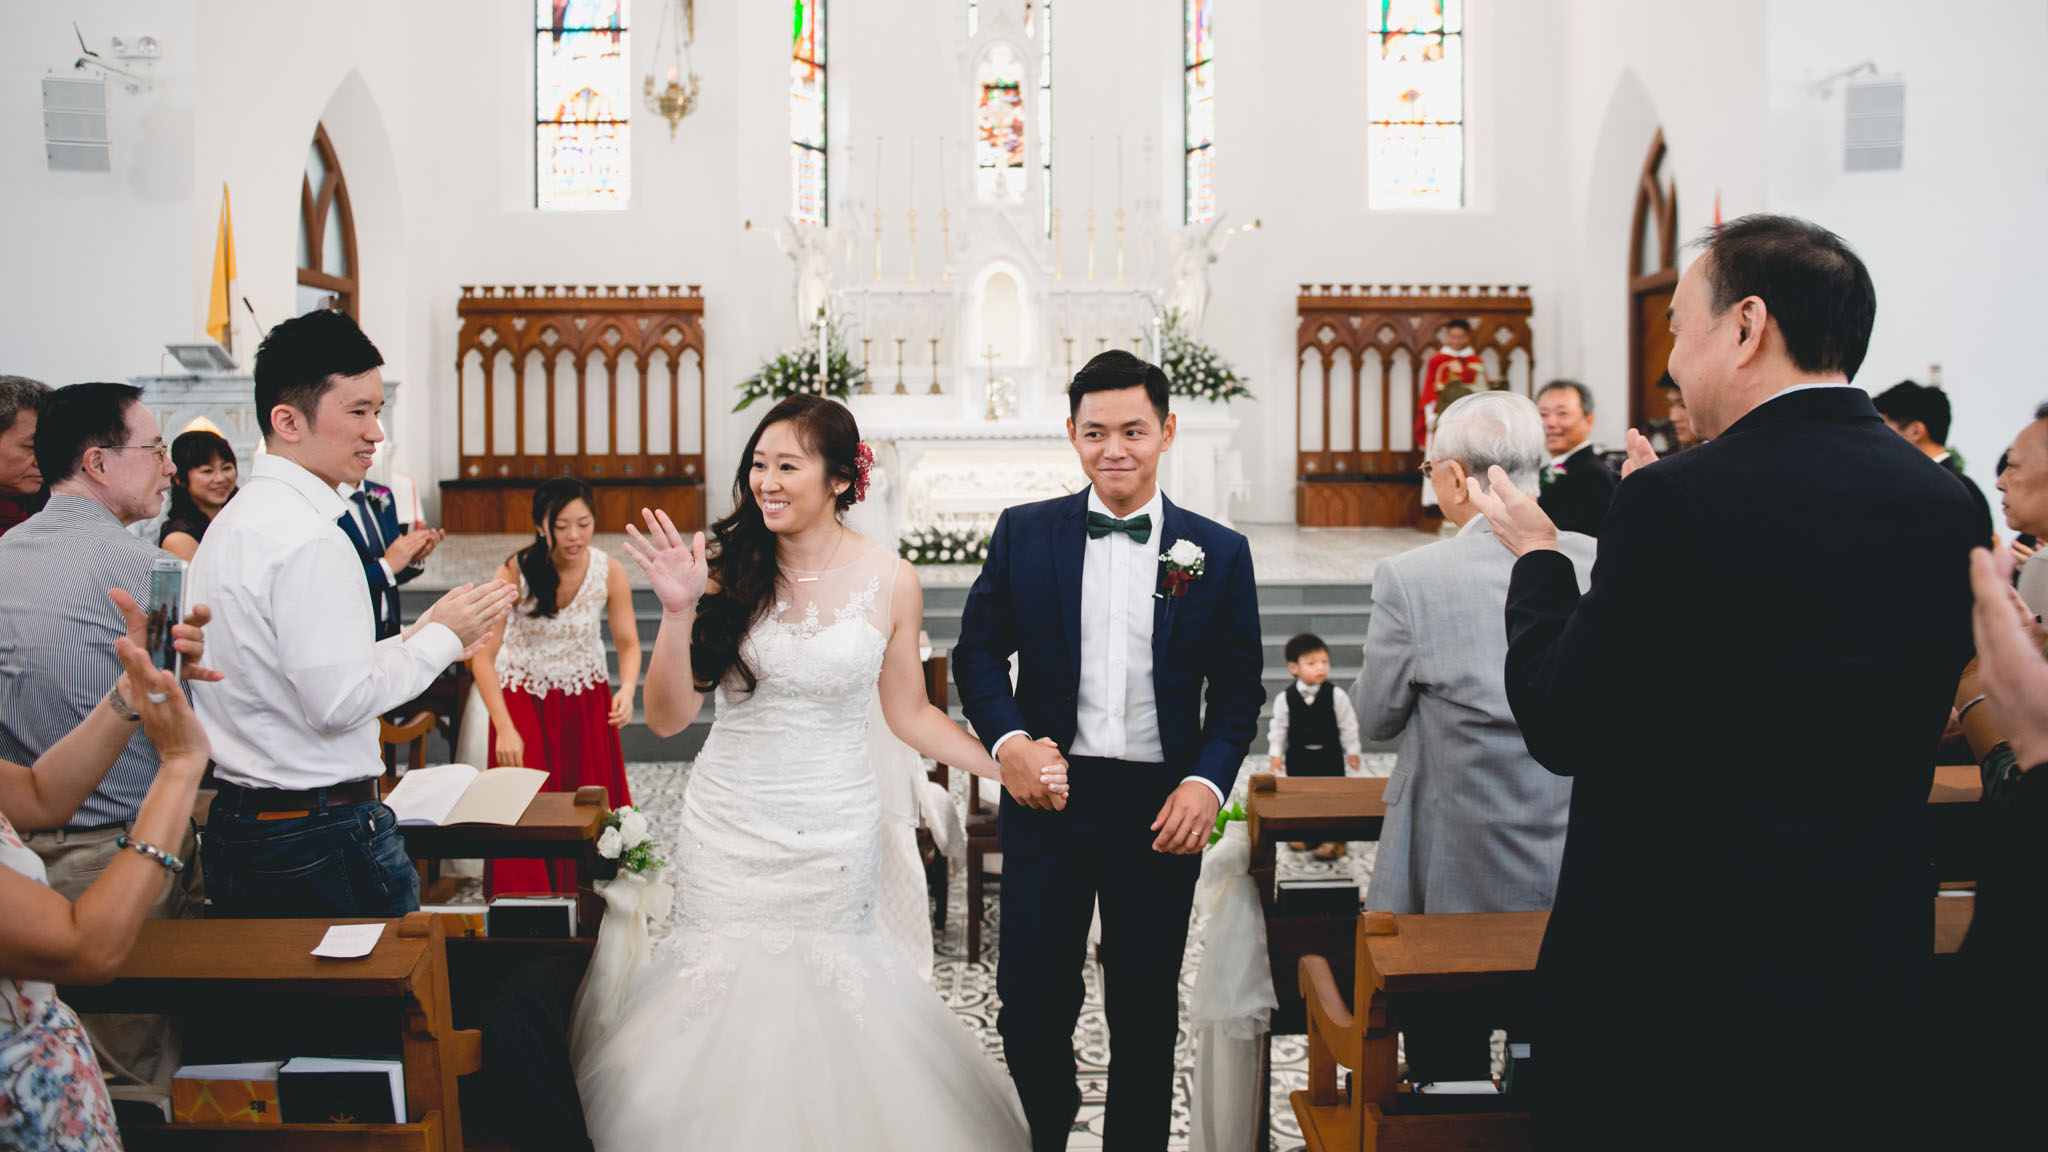 wedding church saints peter and paul 00047.JPG